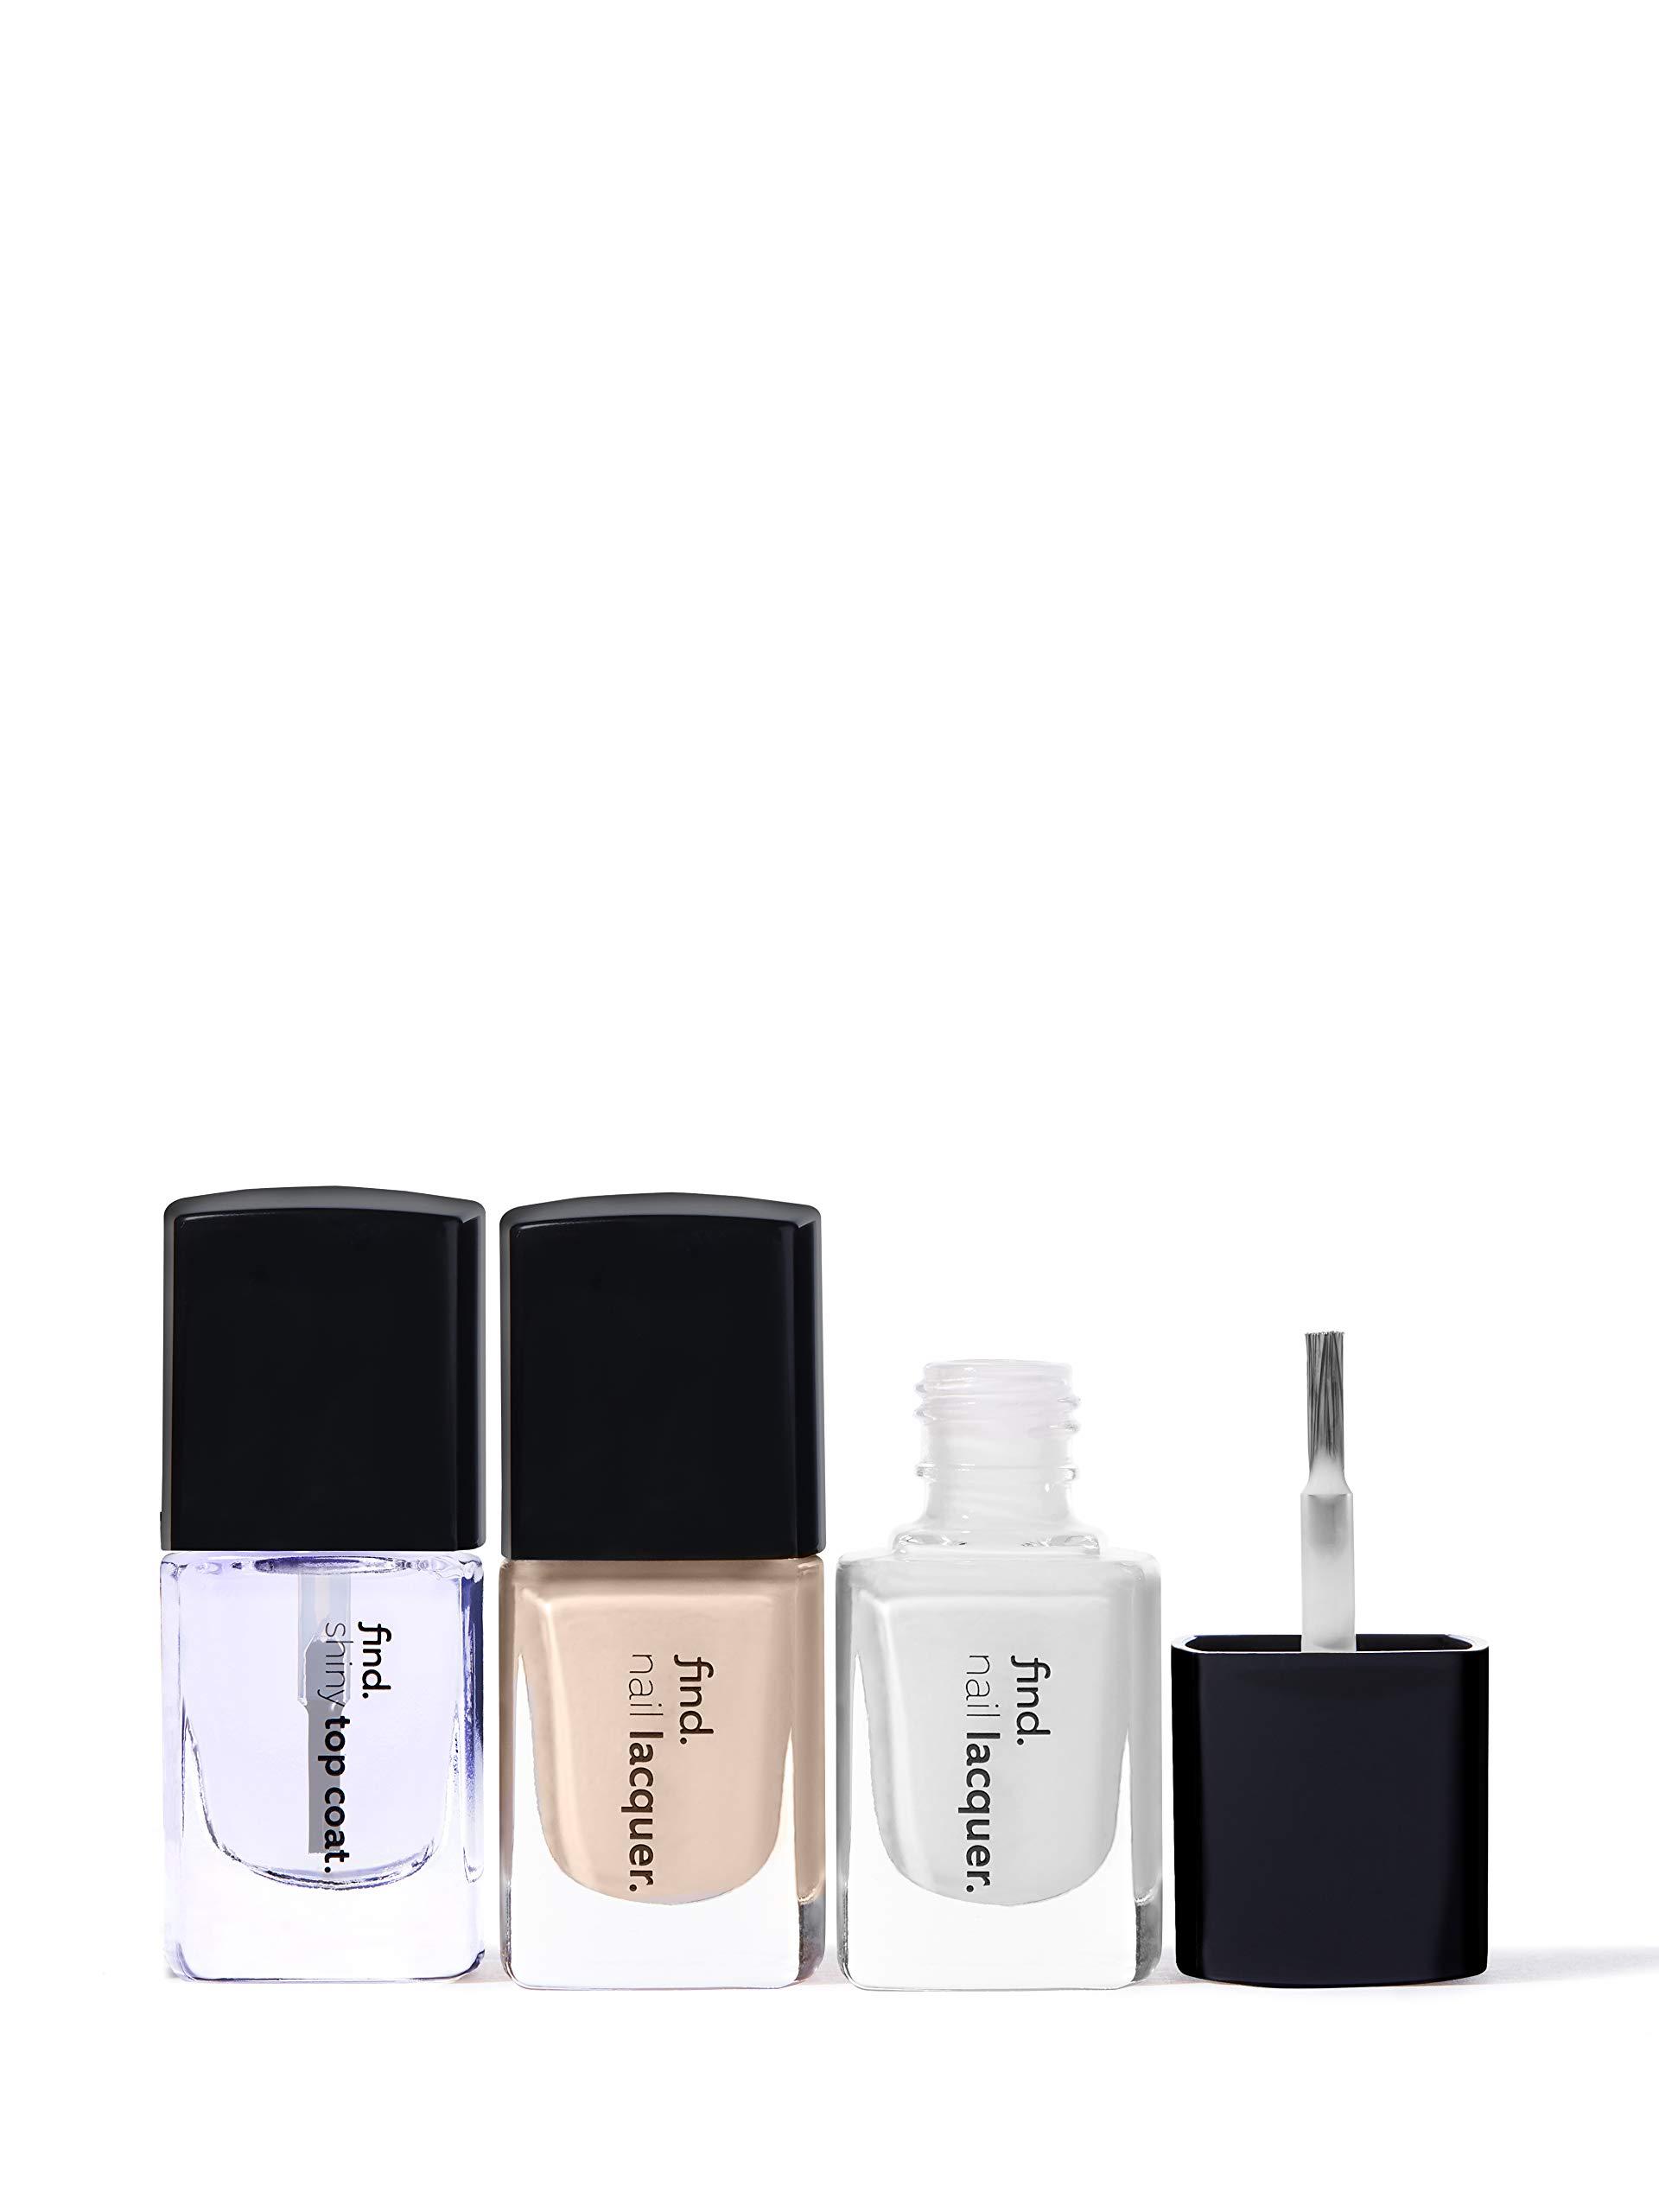 FIND – French Manicure – Esmalte de uñas, n.3 unidades (n.1, n.2, Top Coat)